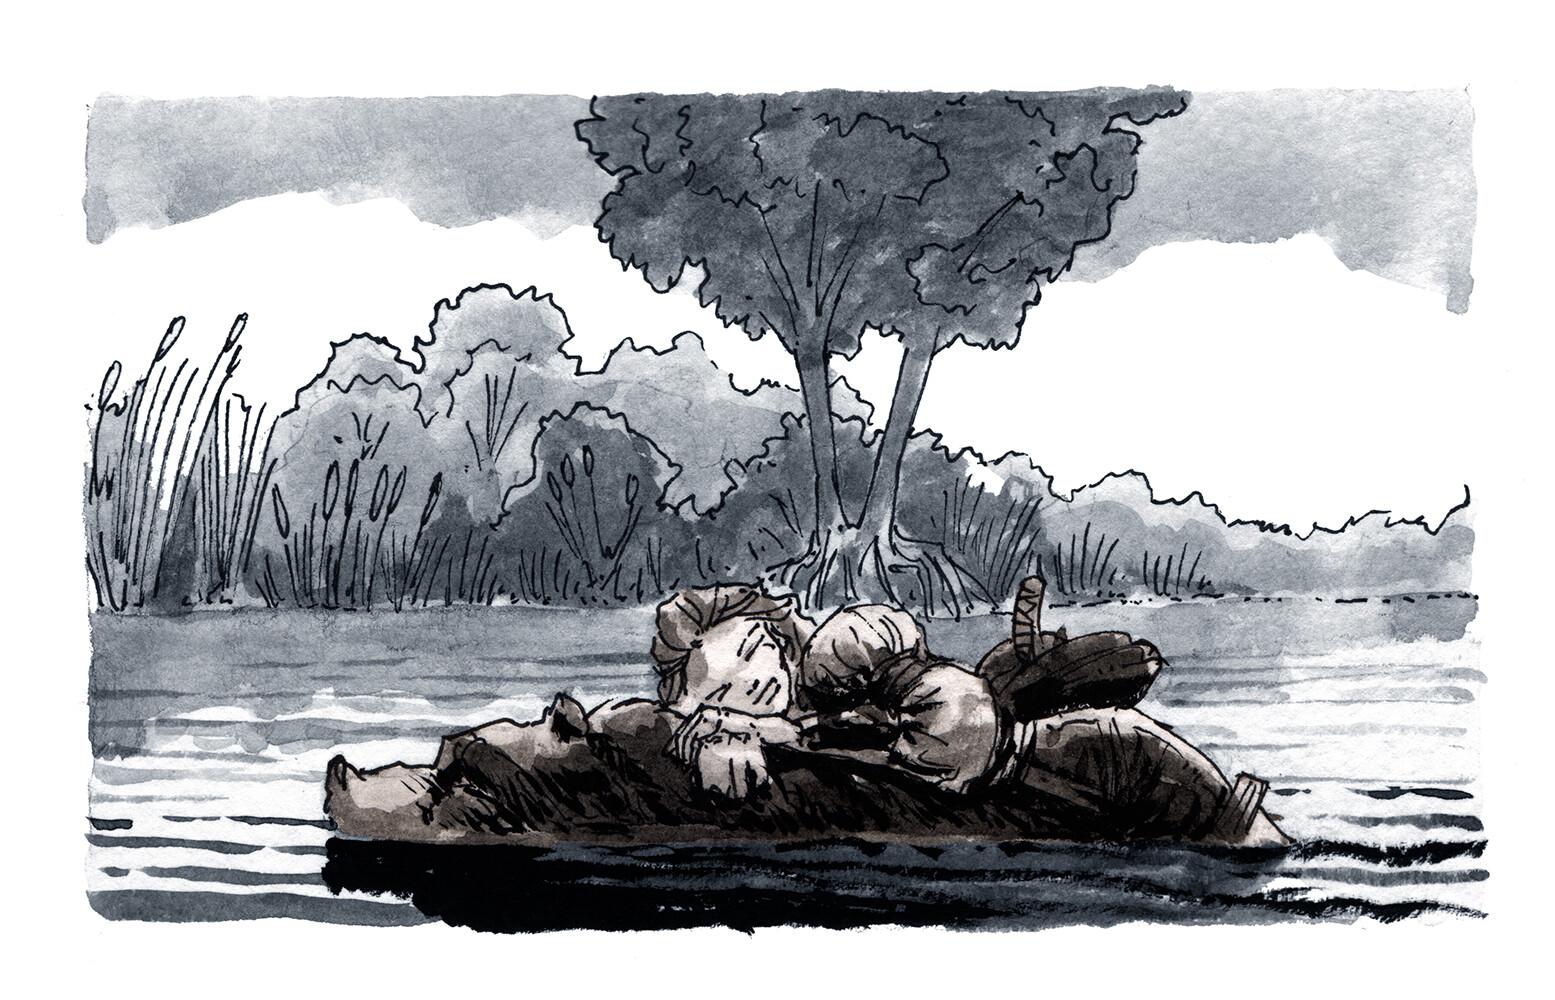 Midhat kapetanovic midhat kapetanovic sketch0550a